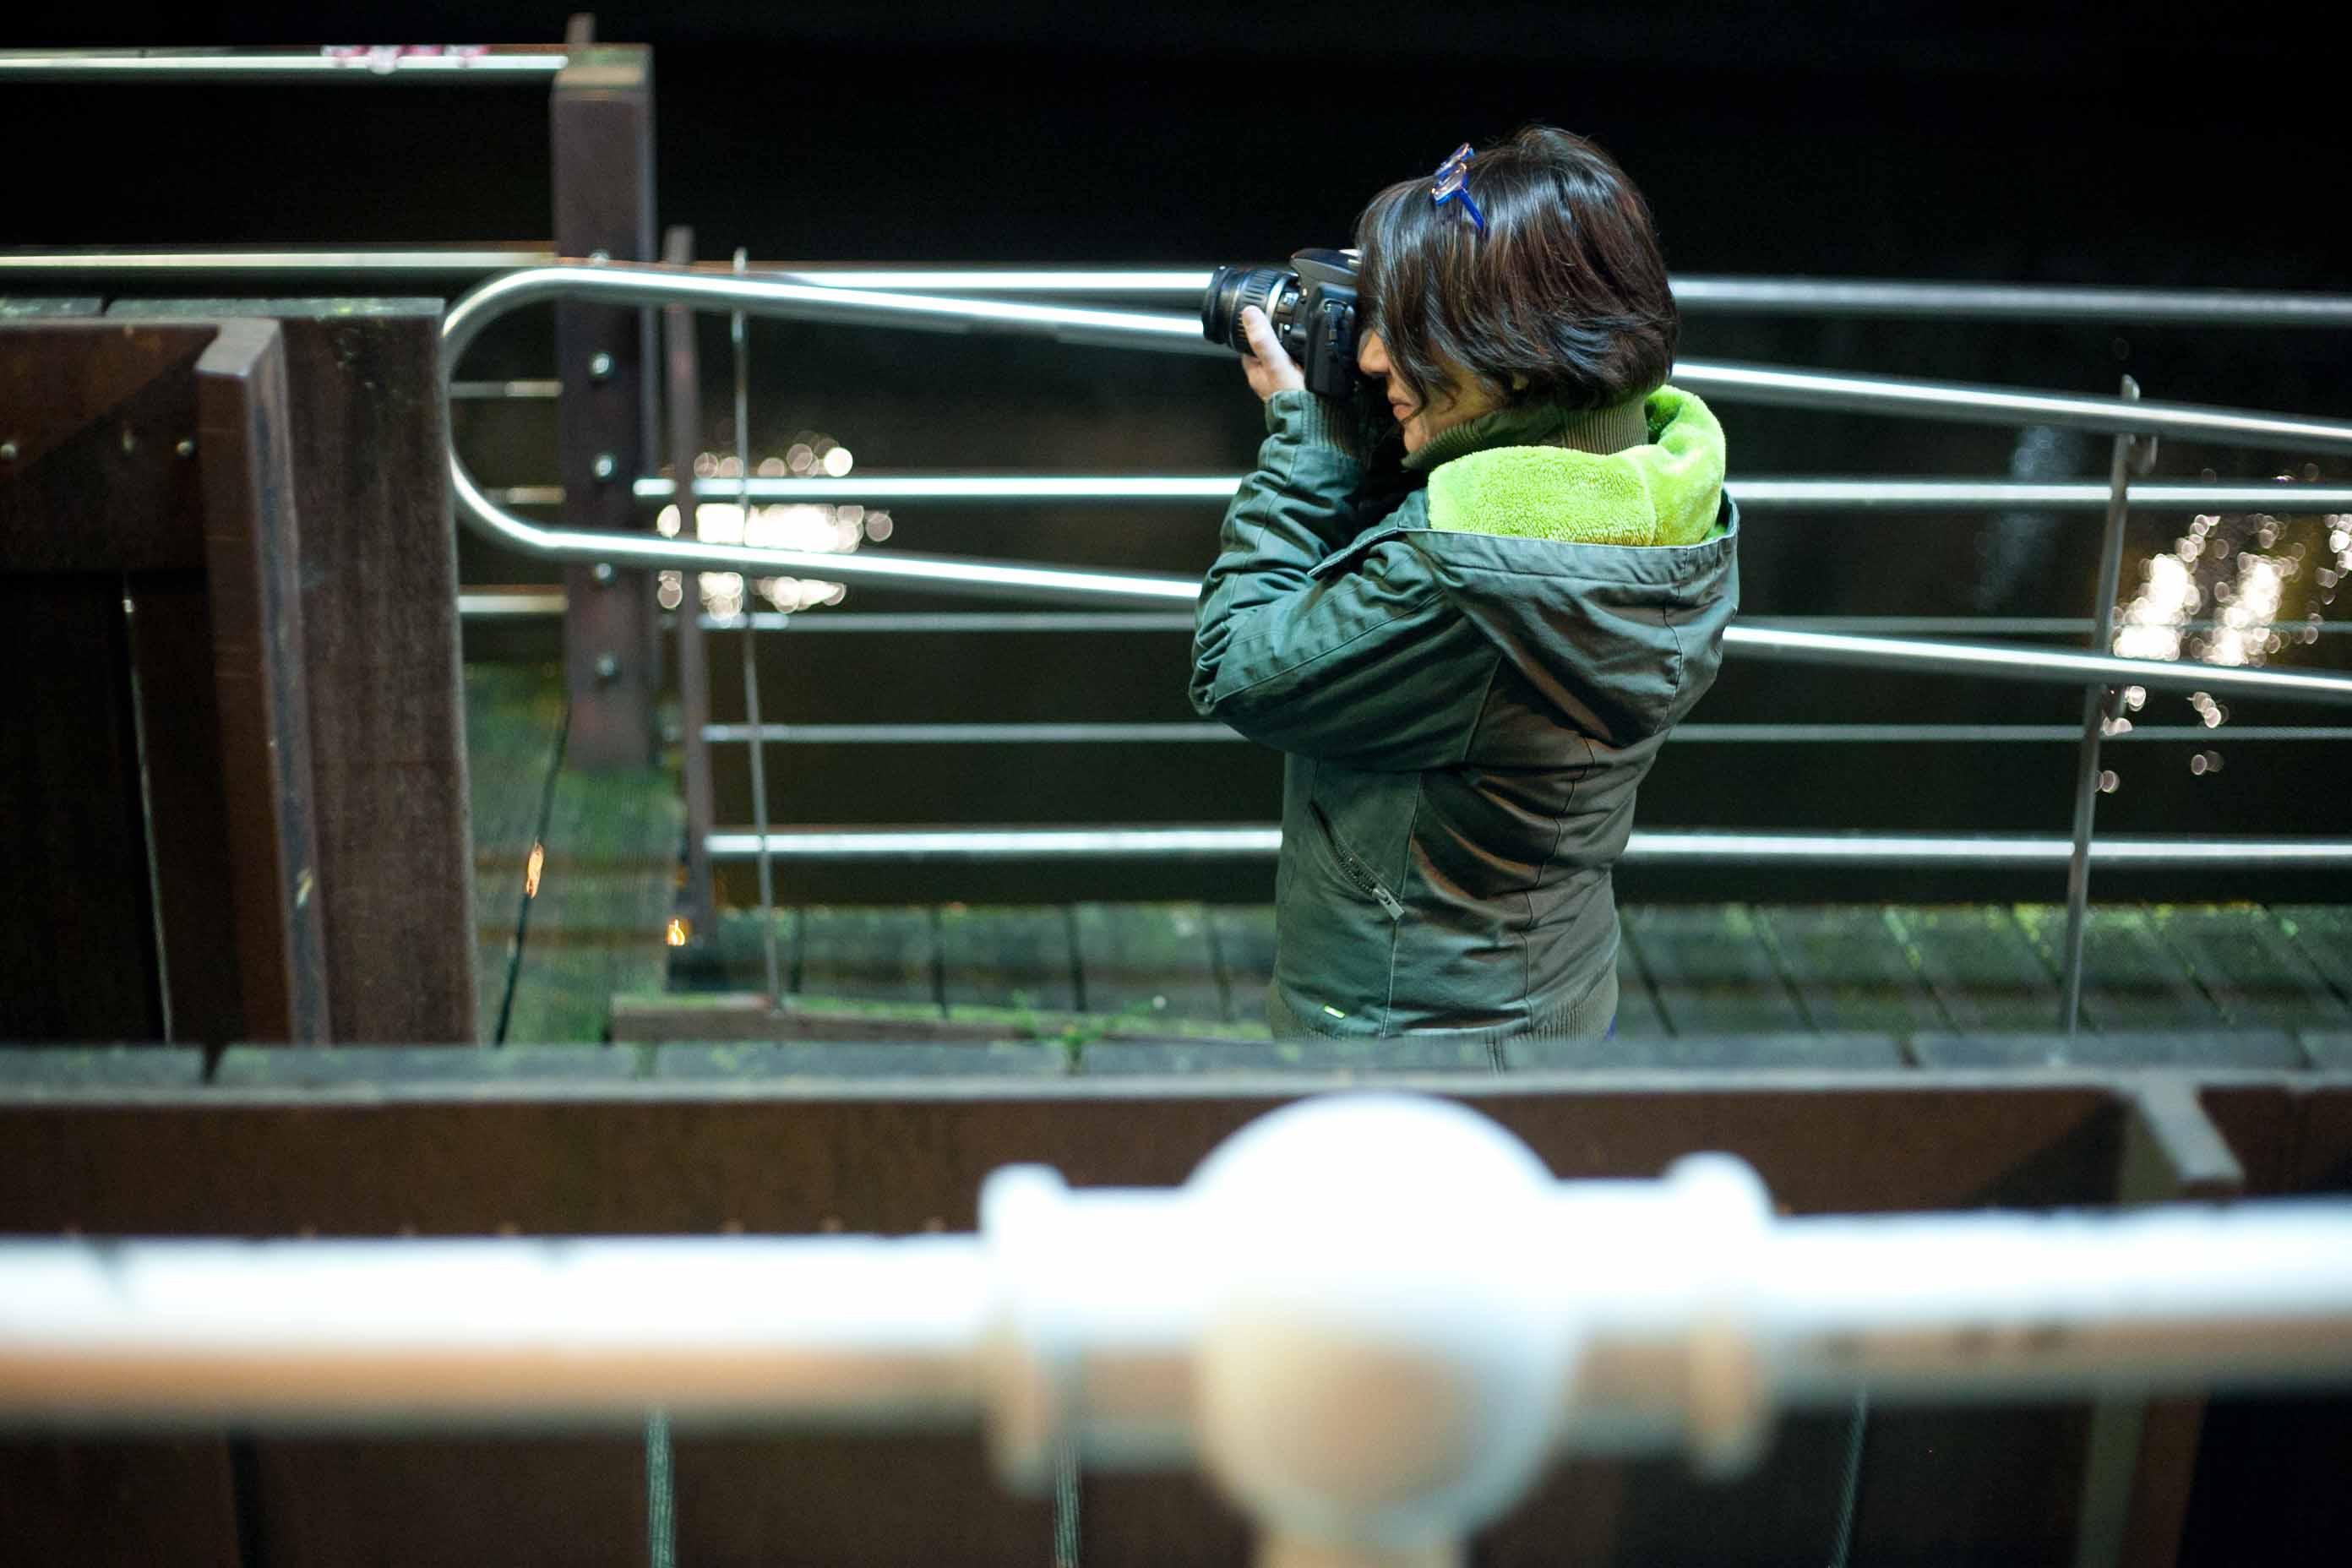 Curso de Iniciación a la fotografia en Bilbao....para repetir.